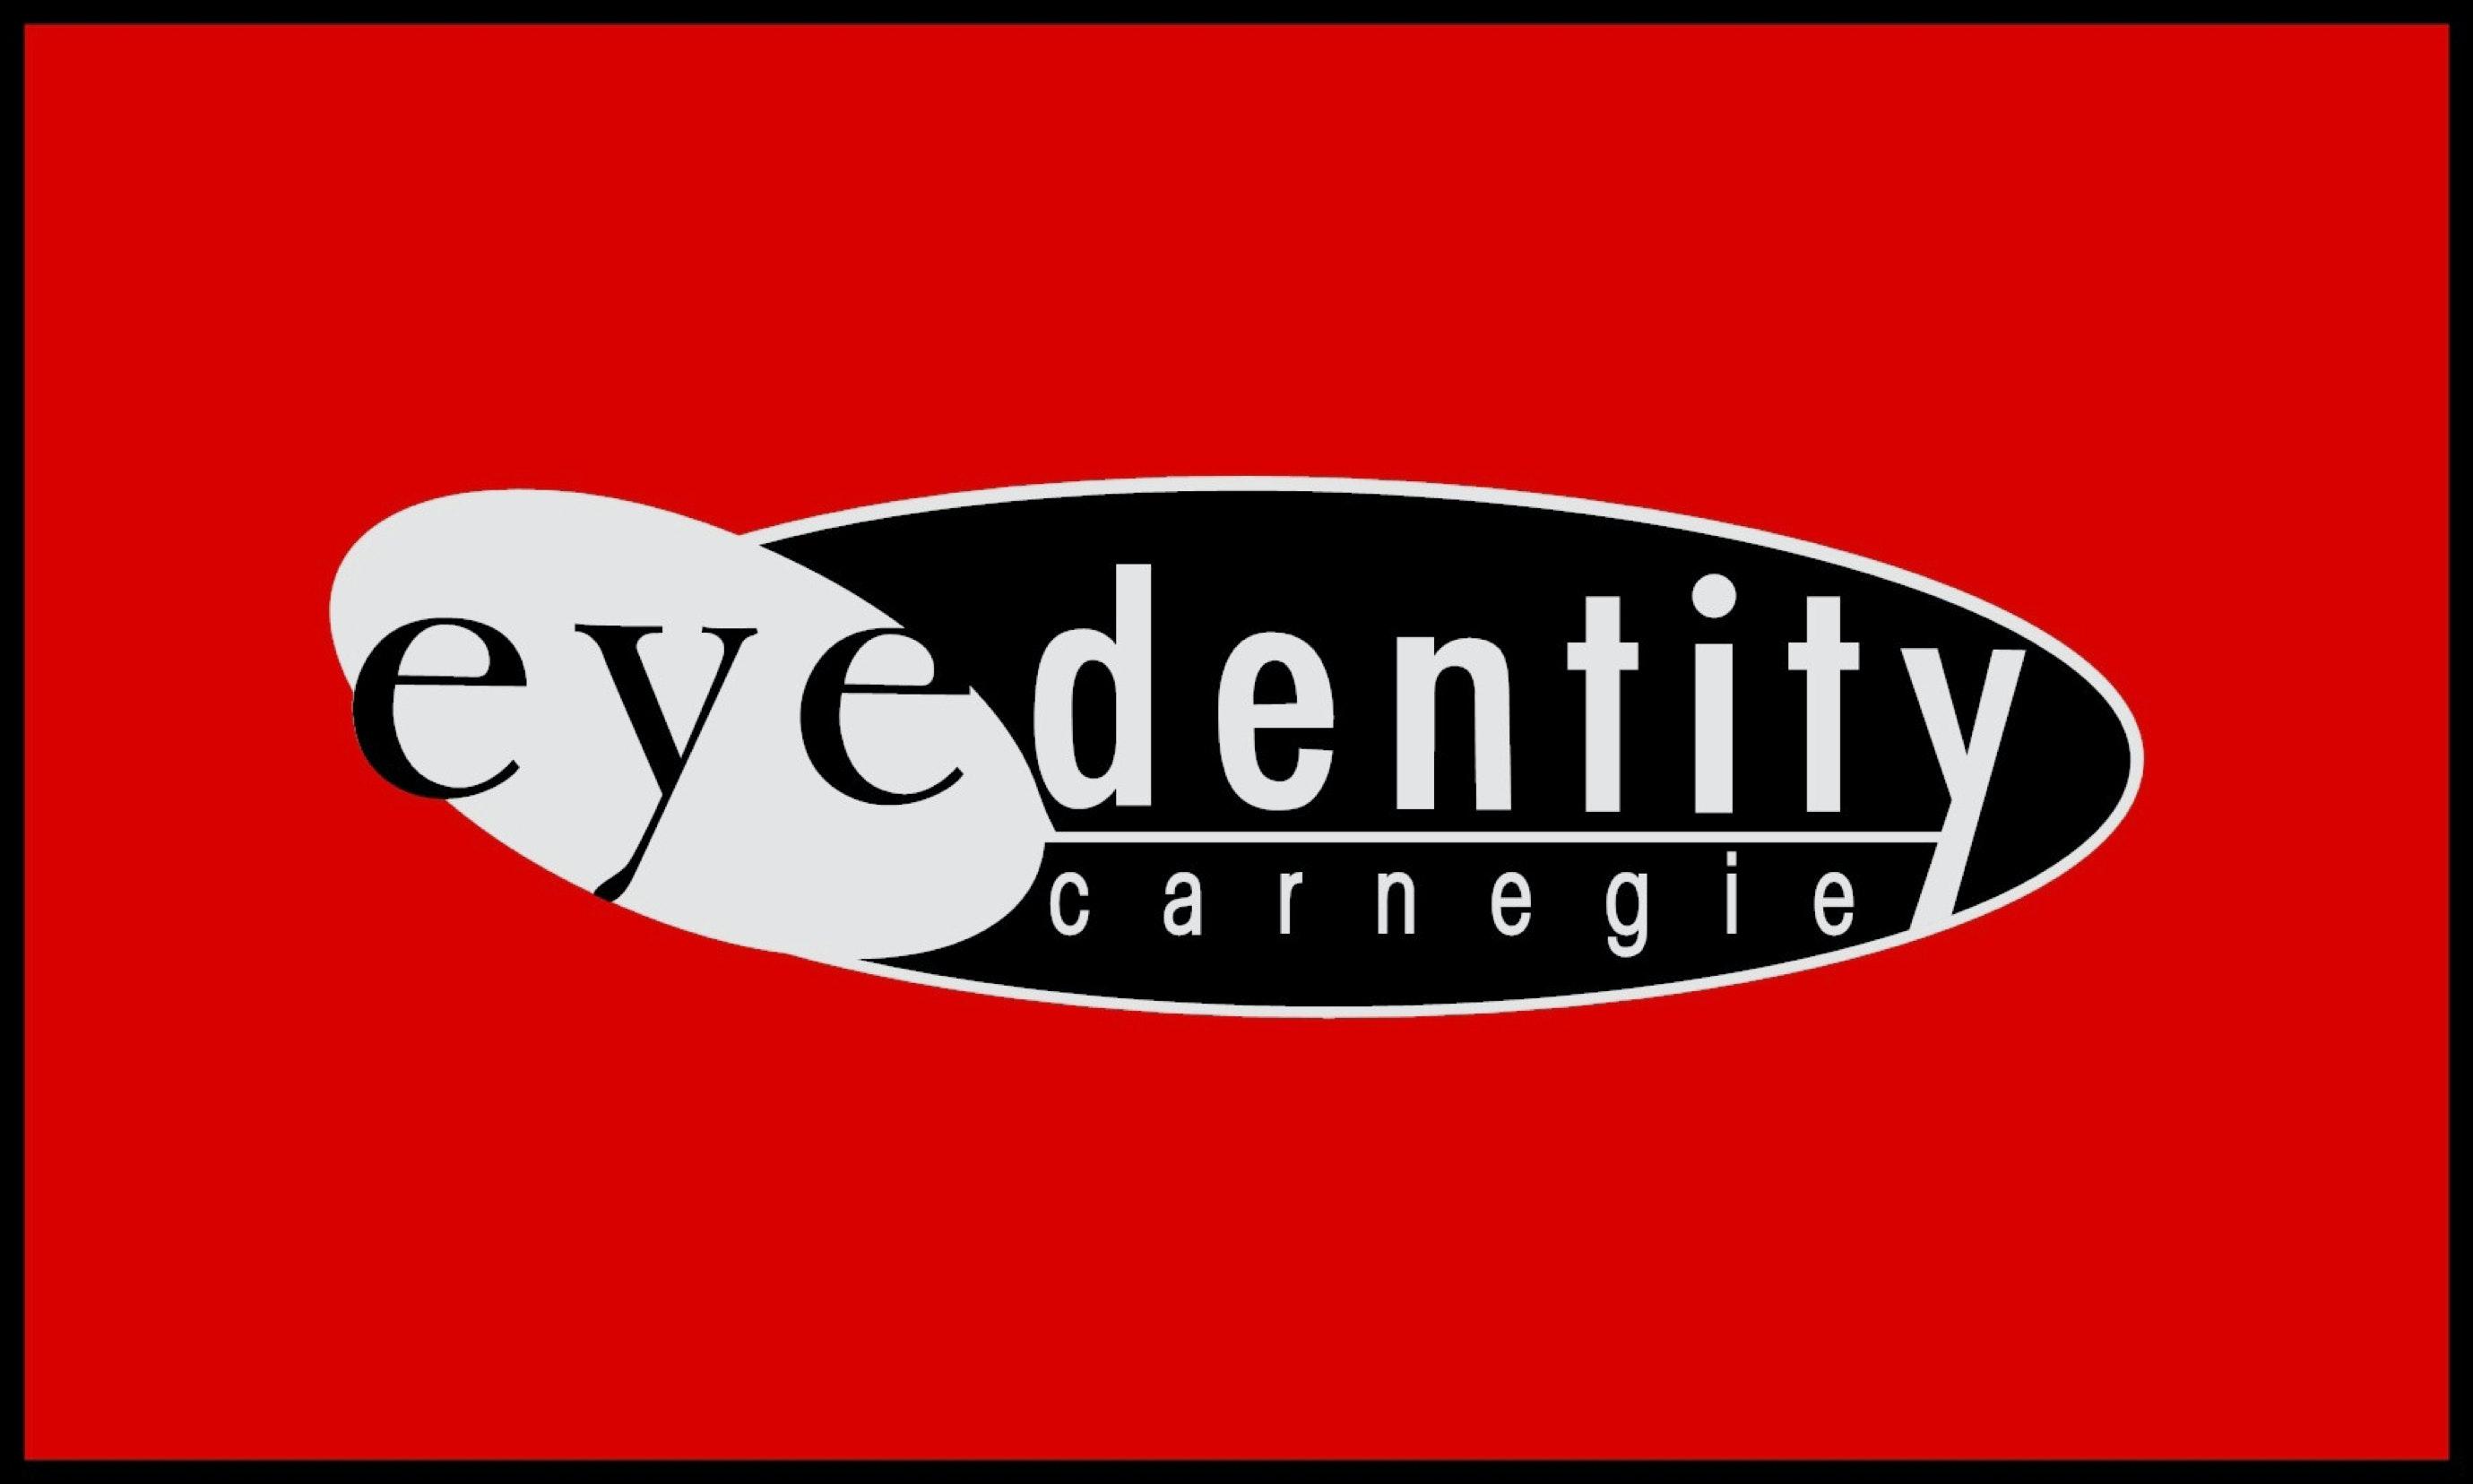 logo for Eyedentity Carnegie Optometrists